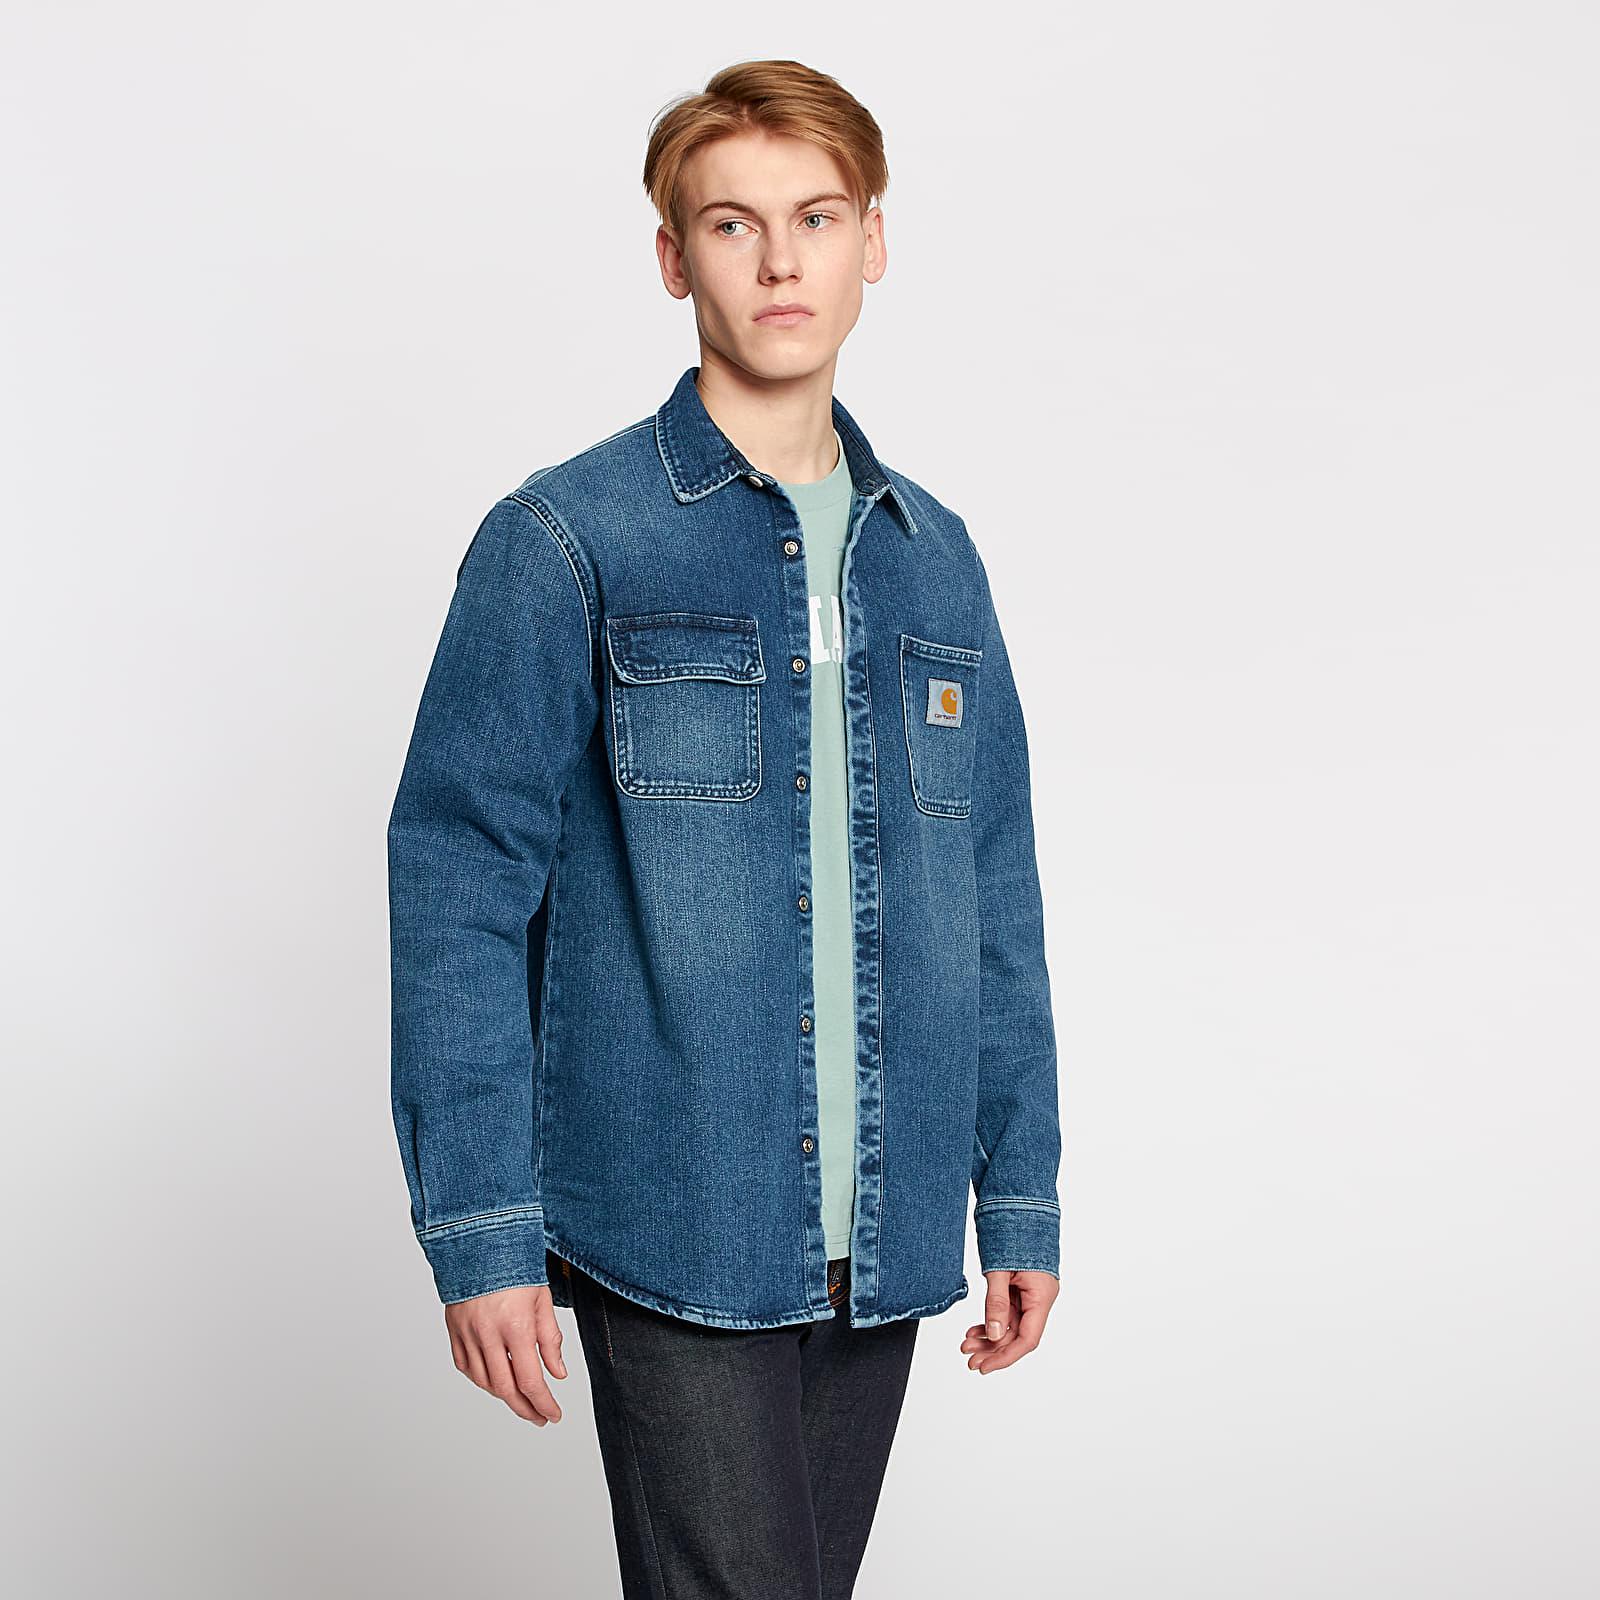 Košile Carhartt WIP Salinac Jacket Shirt Blue